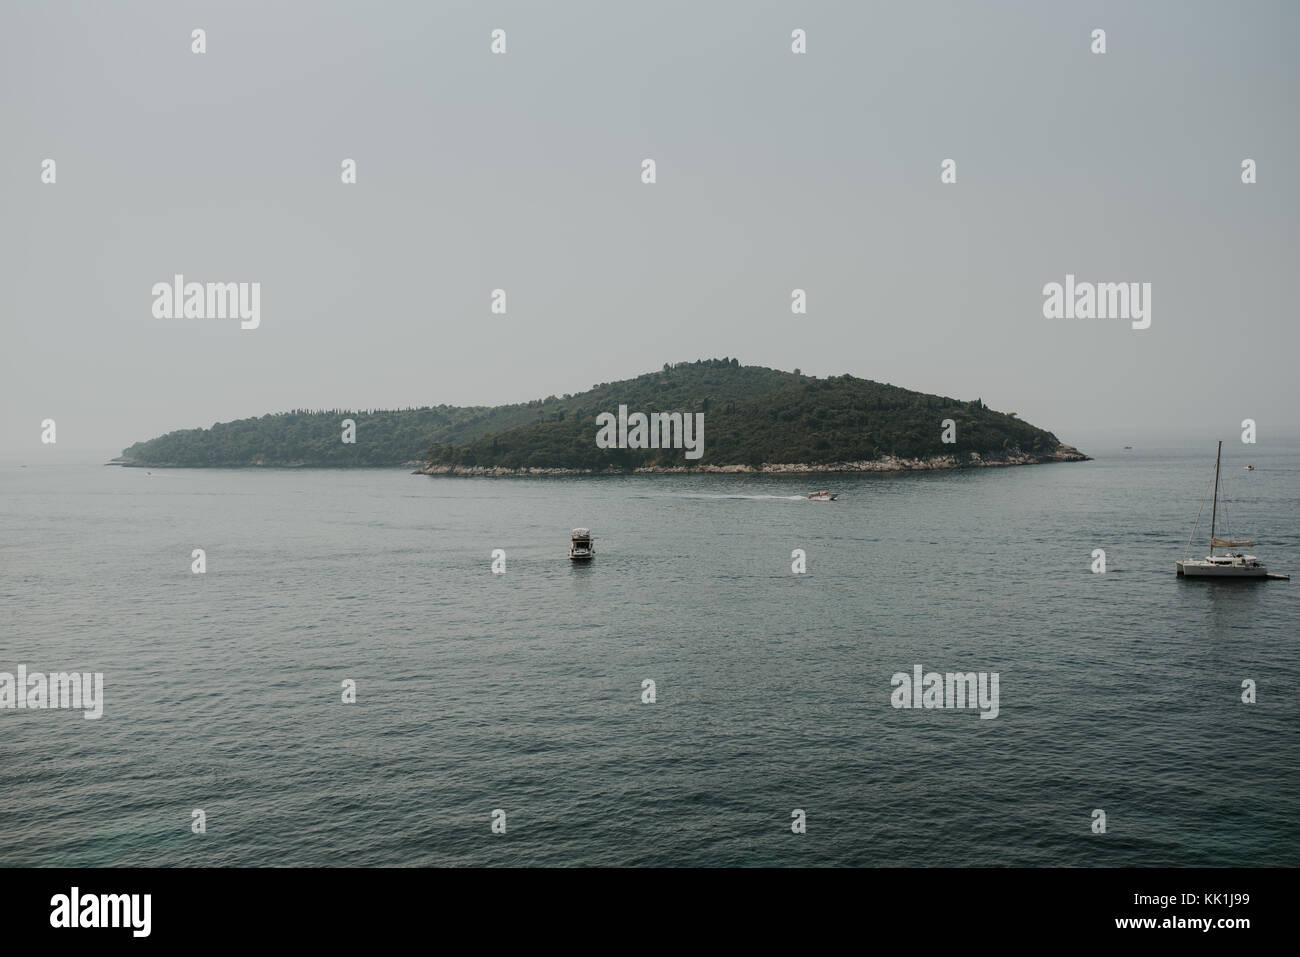 Island of Lokrum in front of Dubrovnik, Croatia - Stock Image